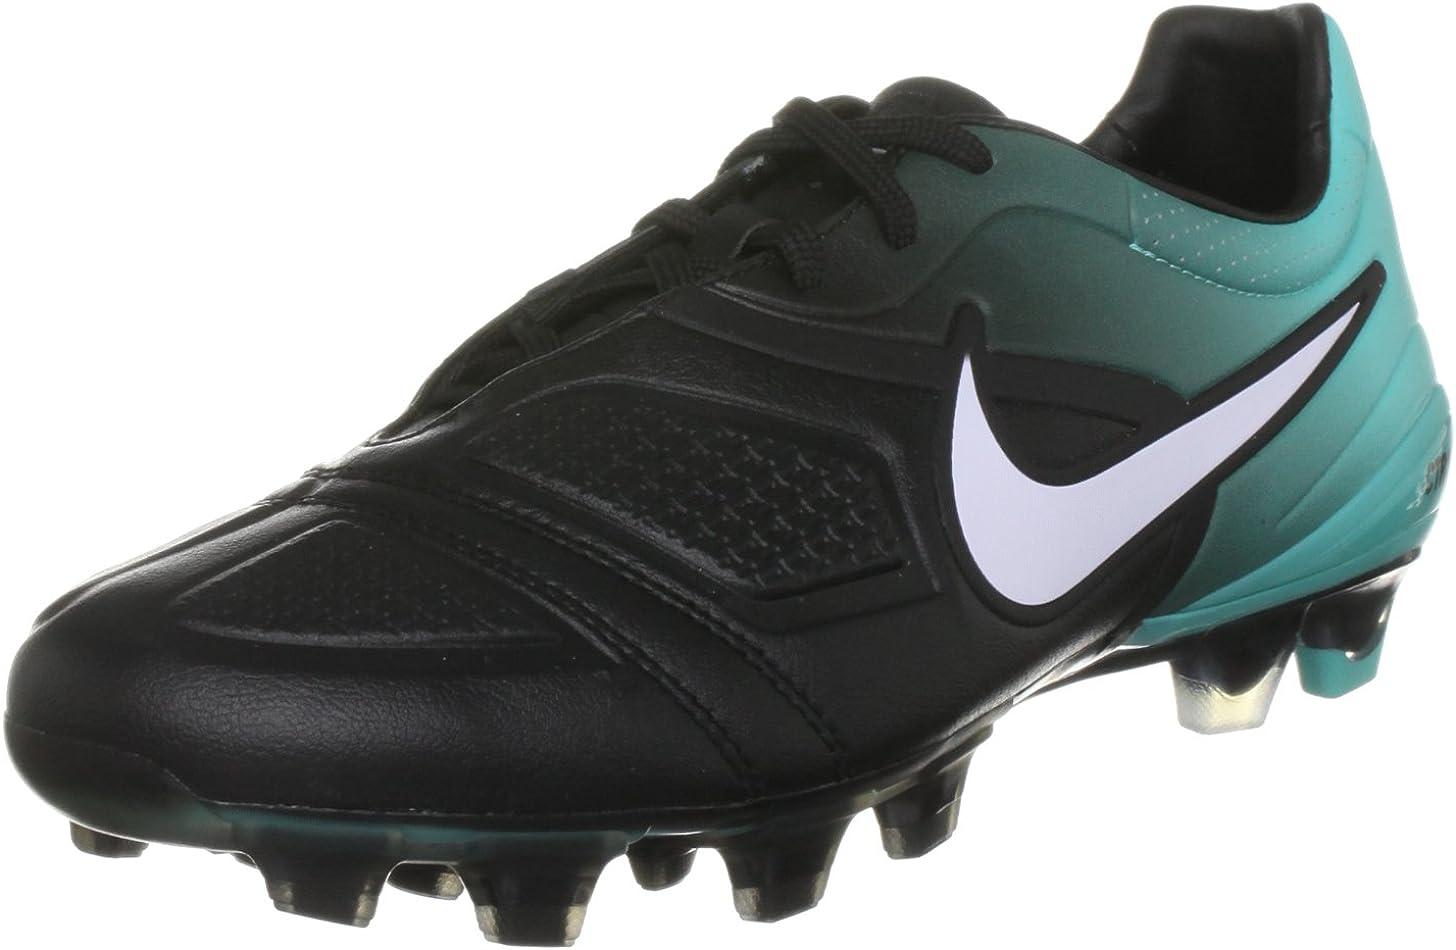 Nike Ctr 360 Maestri Fg, Men's Football